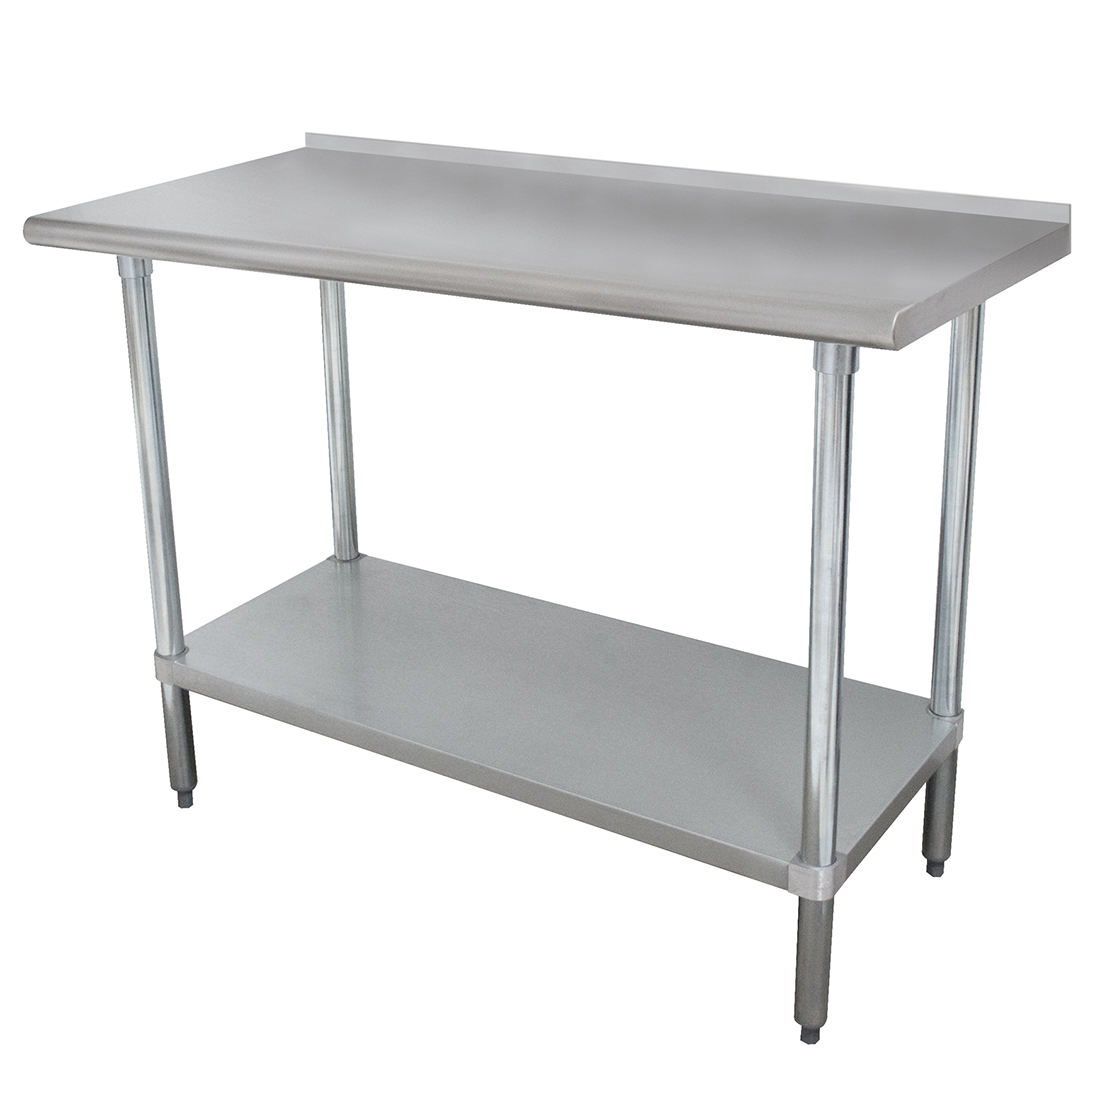 Advance Tabco FAG-2411 work table, 121